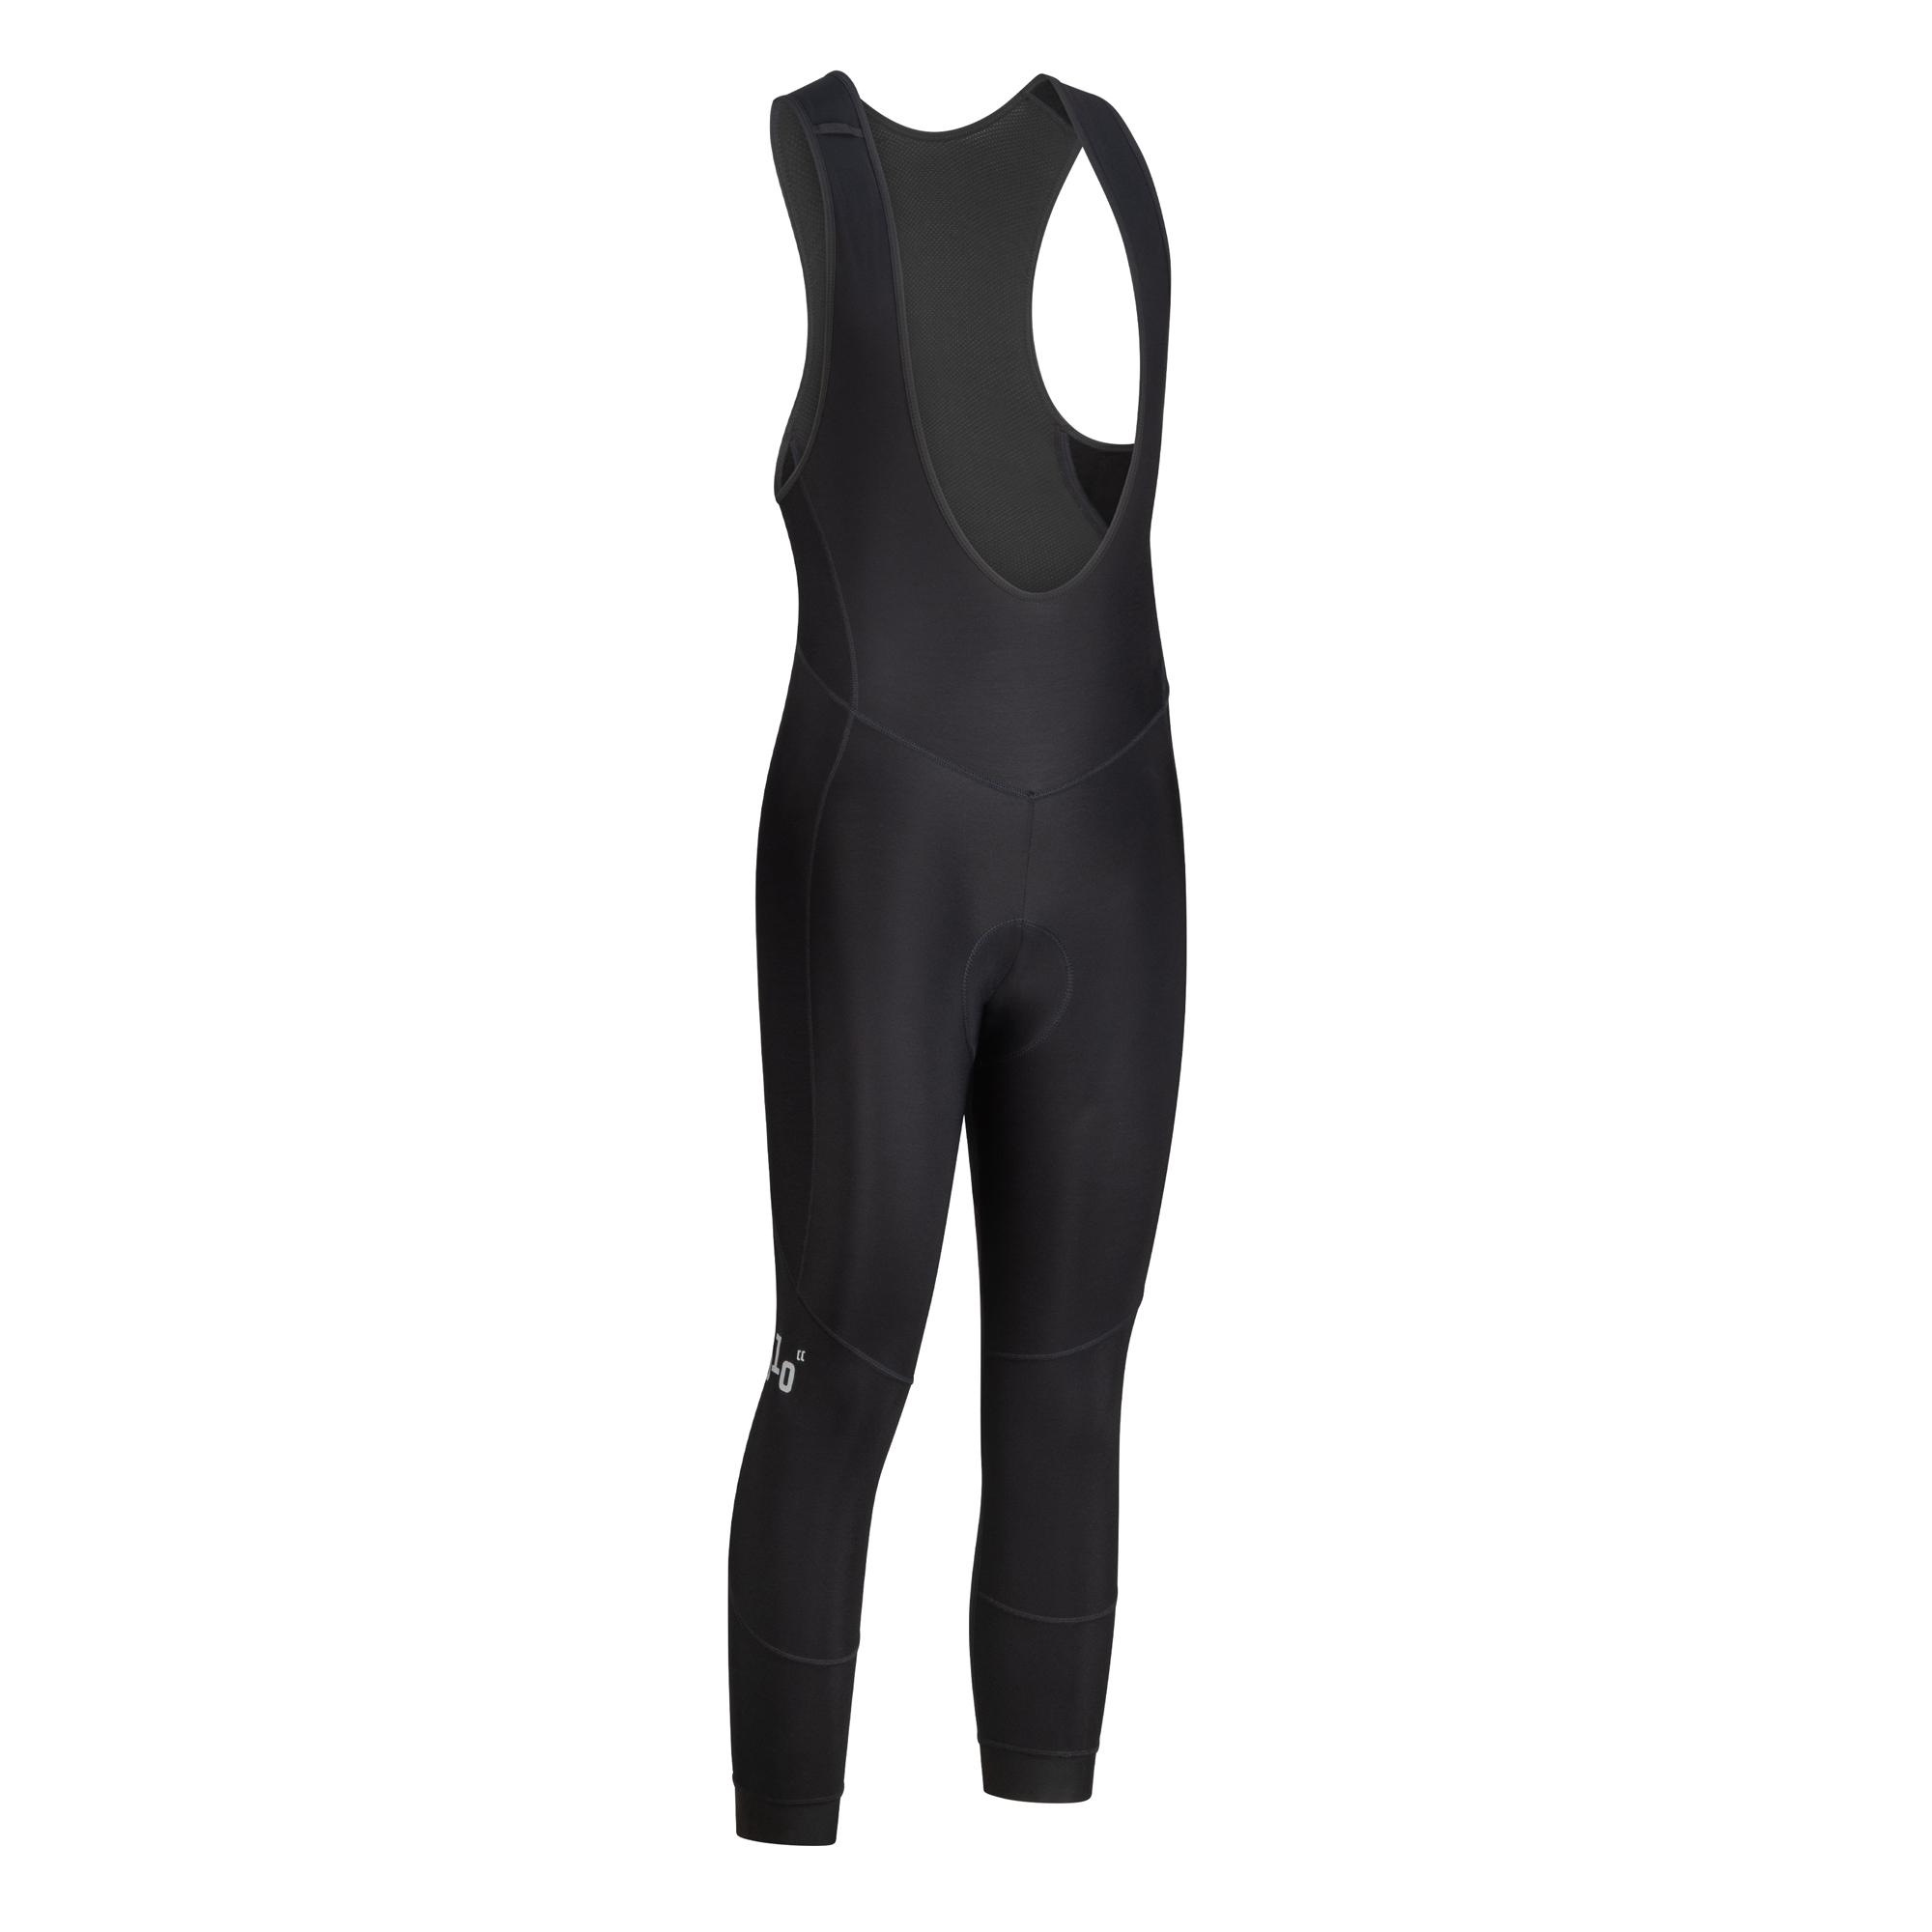 Men's Thermal 3/4 Bib Shorts